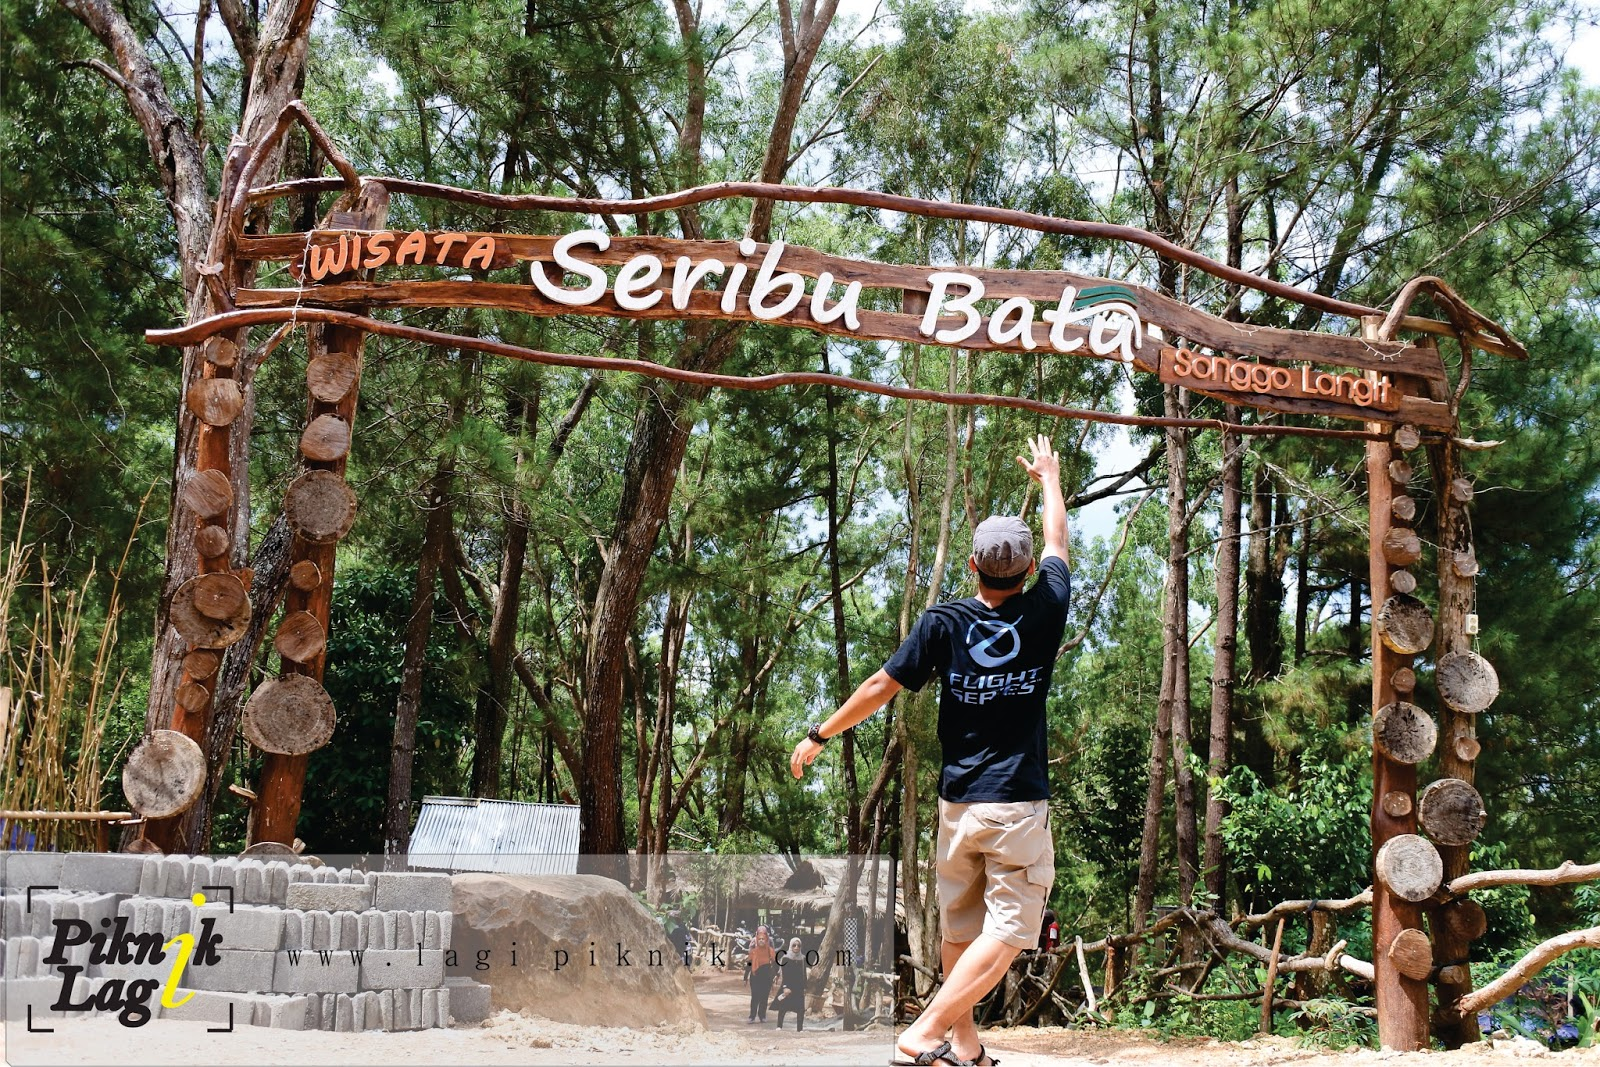 Objek Wisata Seribu Batu Songgo Langit Yang Sangat Unik